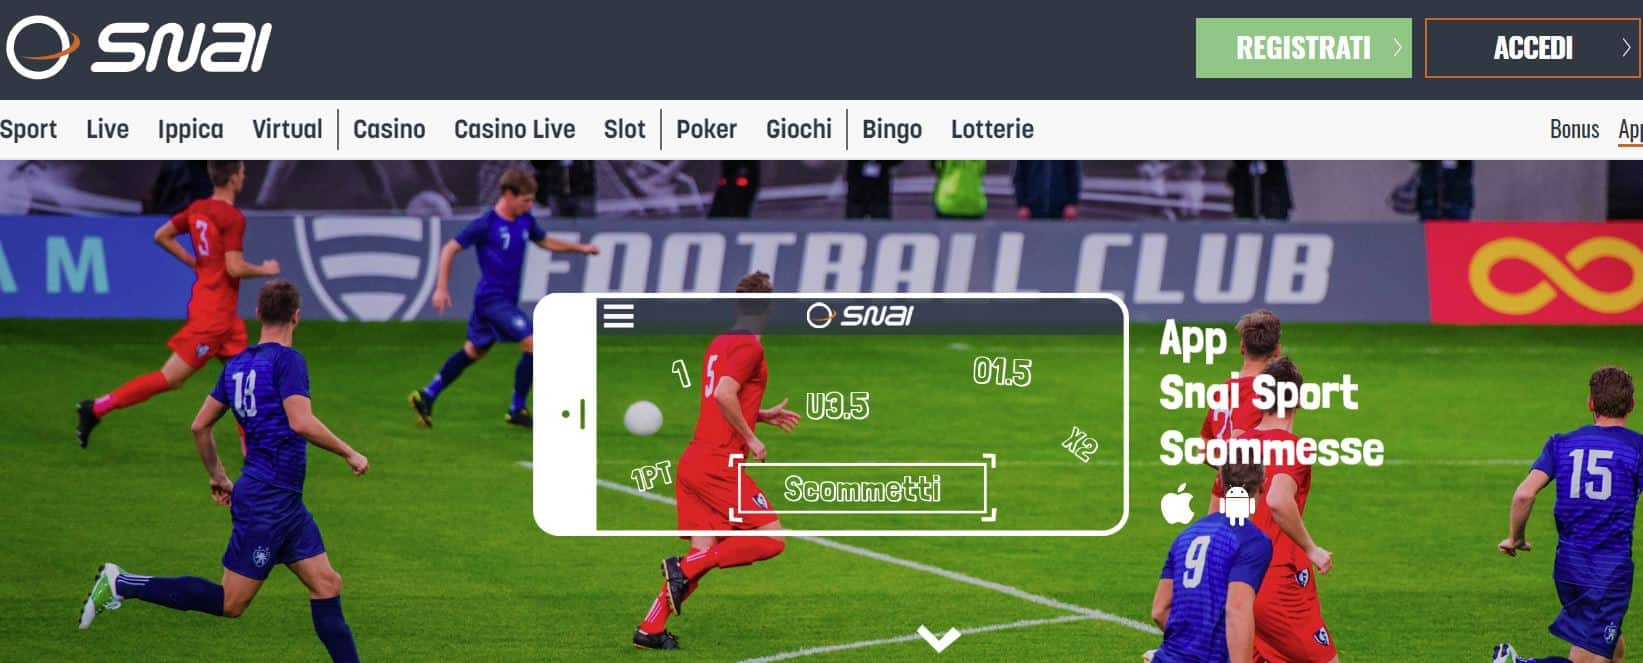 App Snai Sport